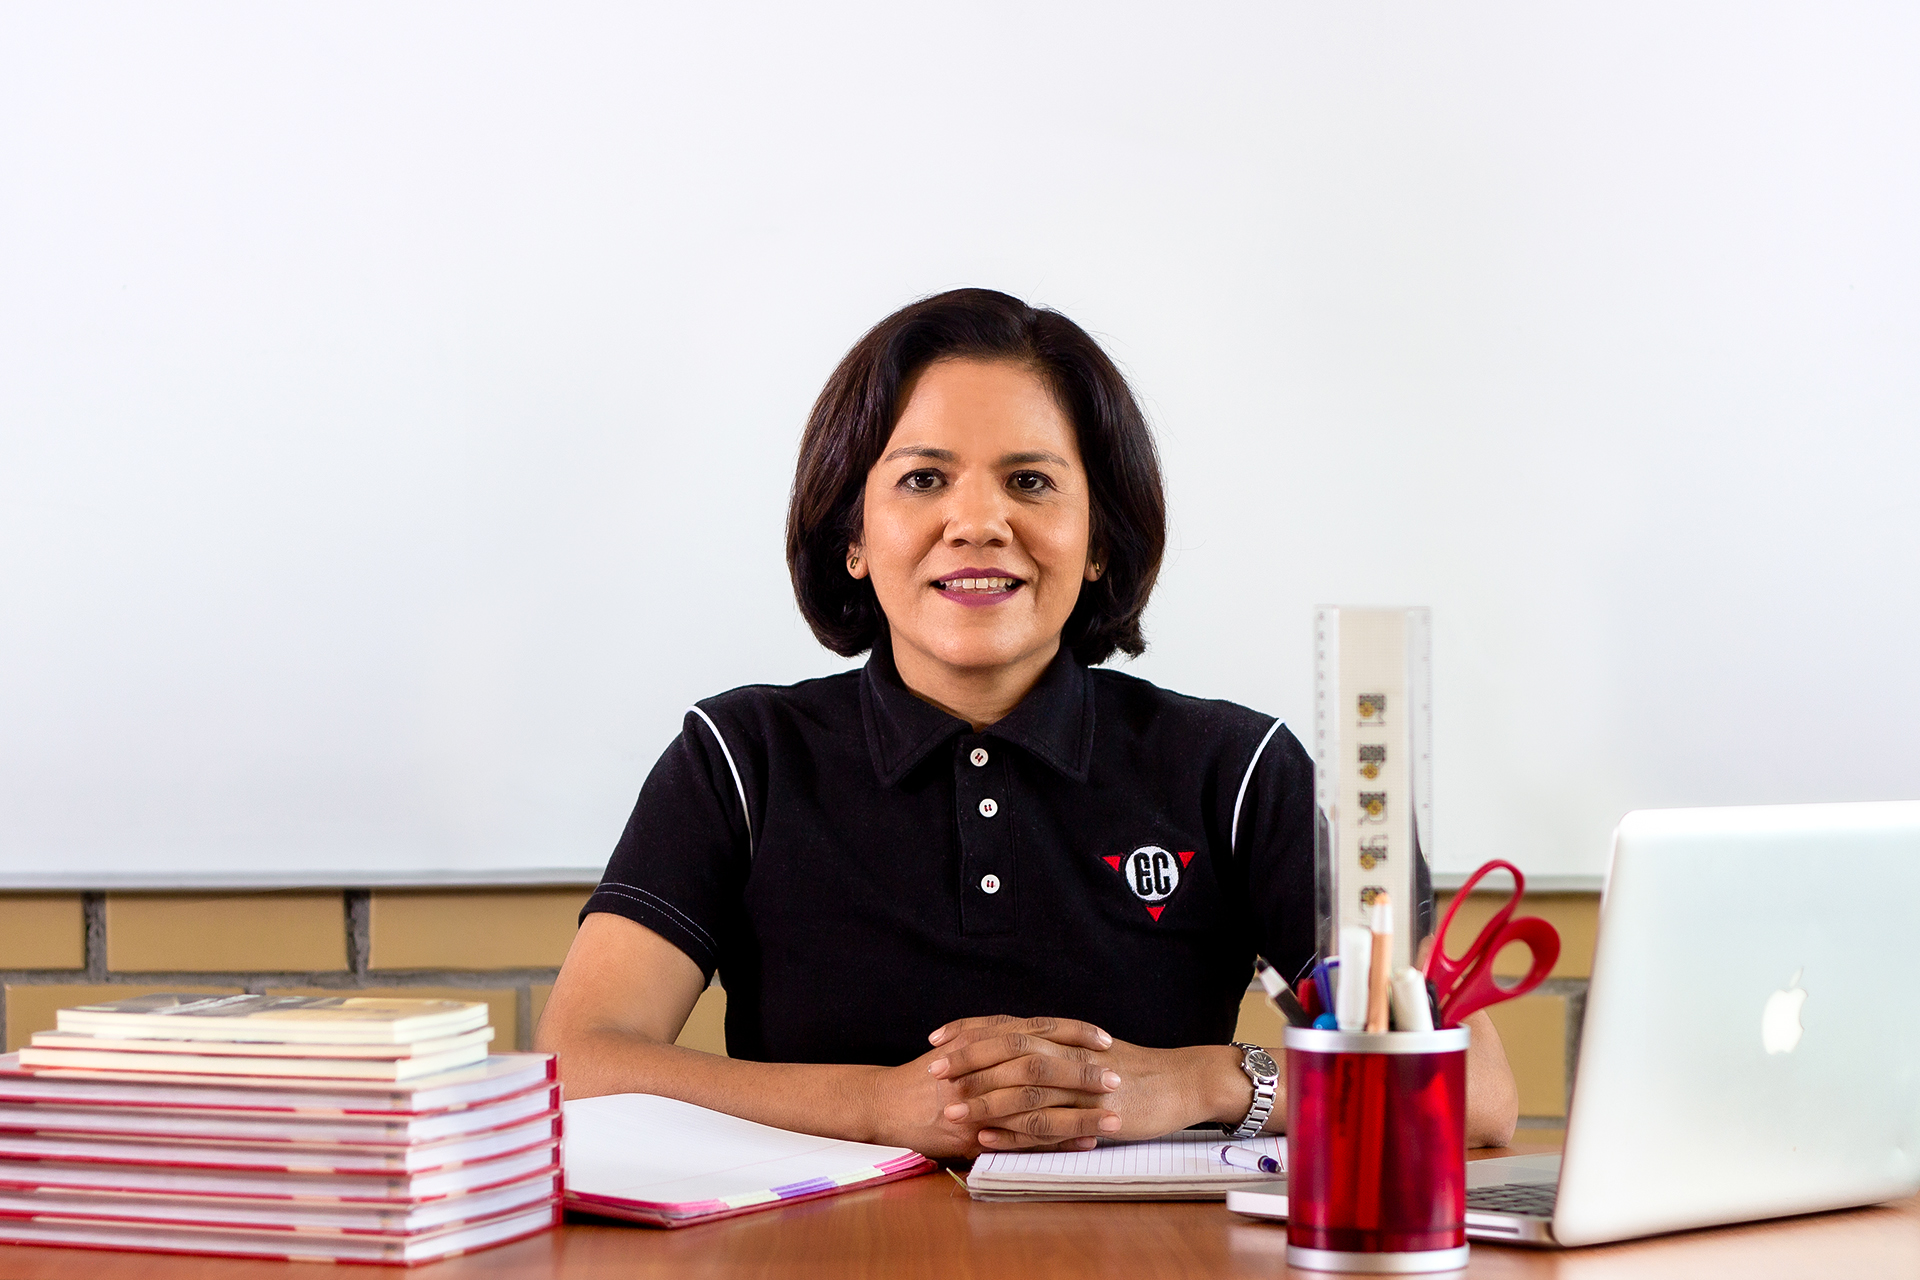 Diana Velasco Rubio - Maestra de Inglés Primaria